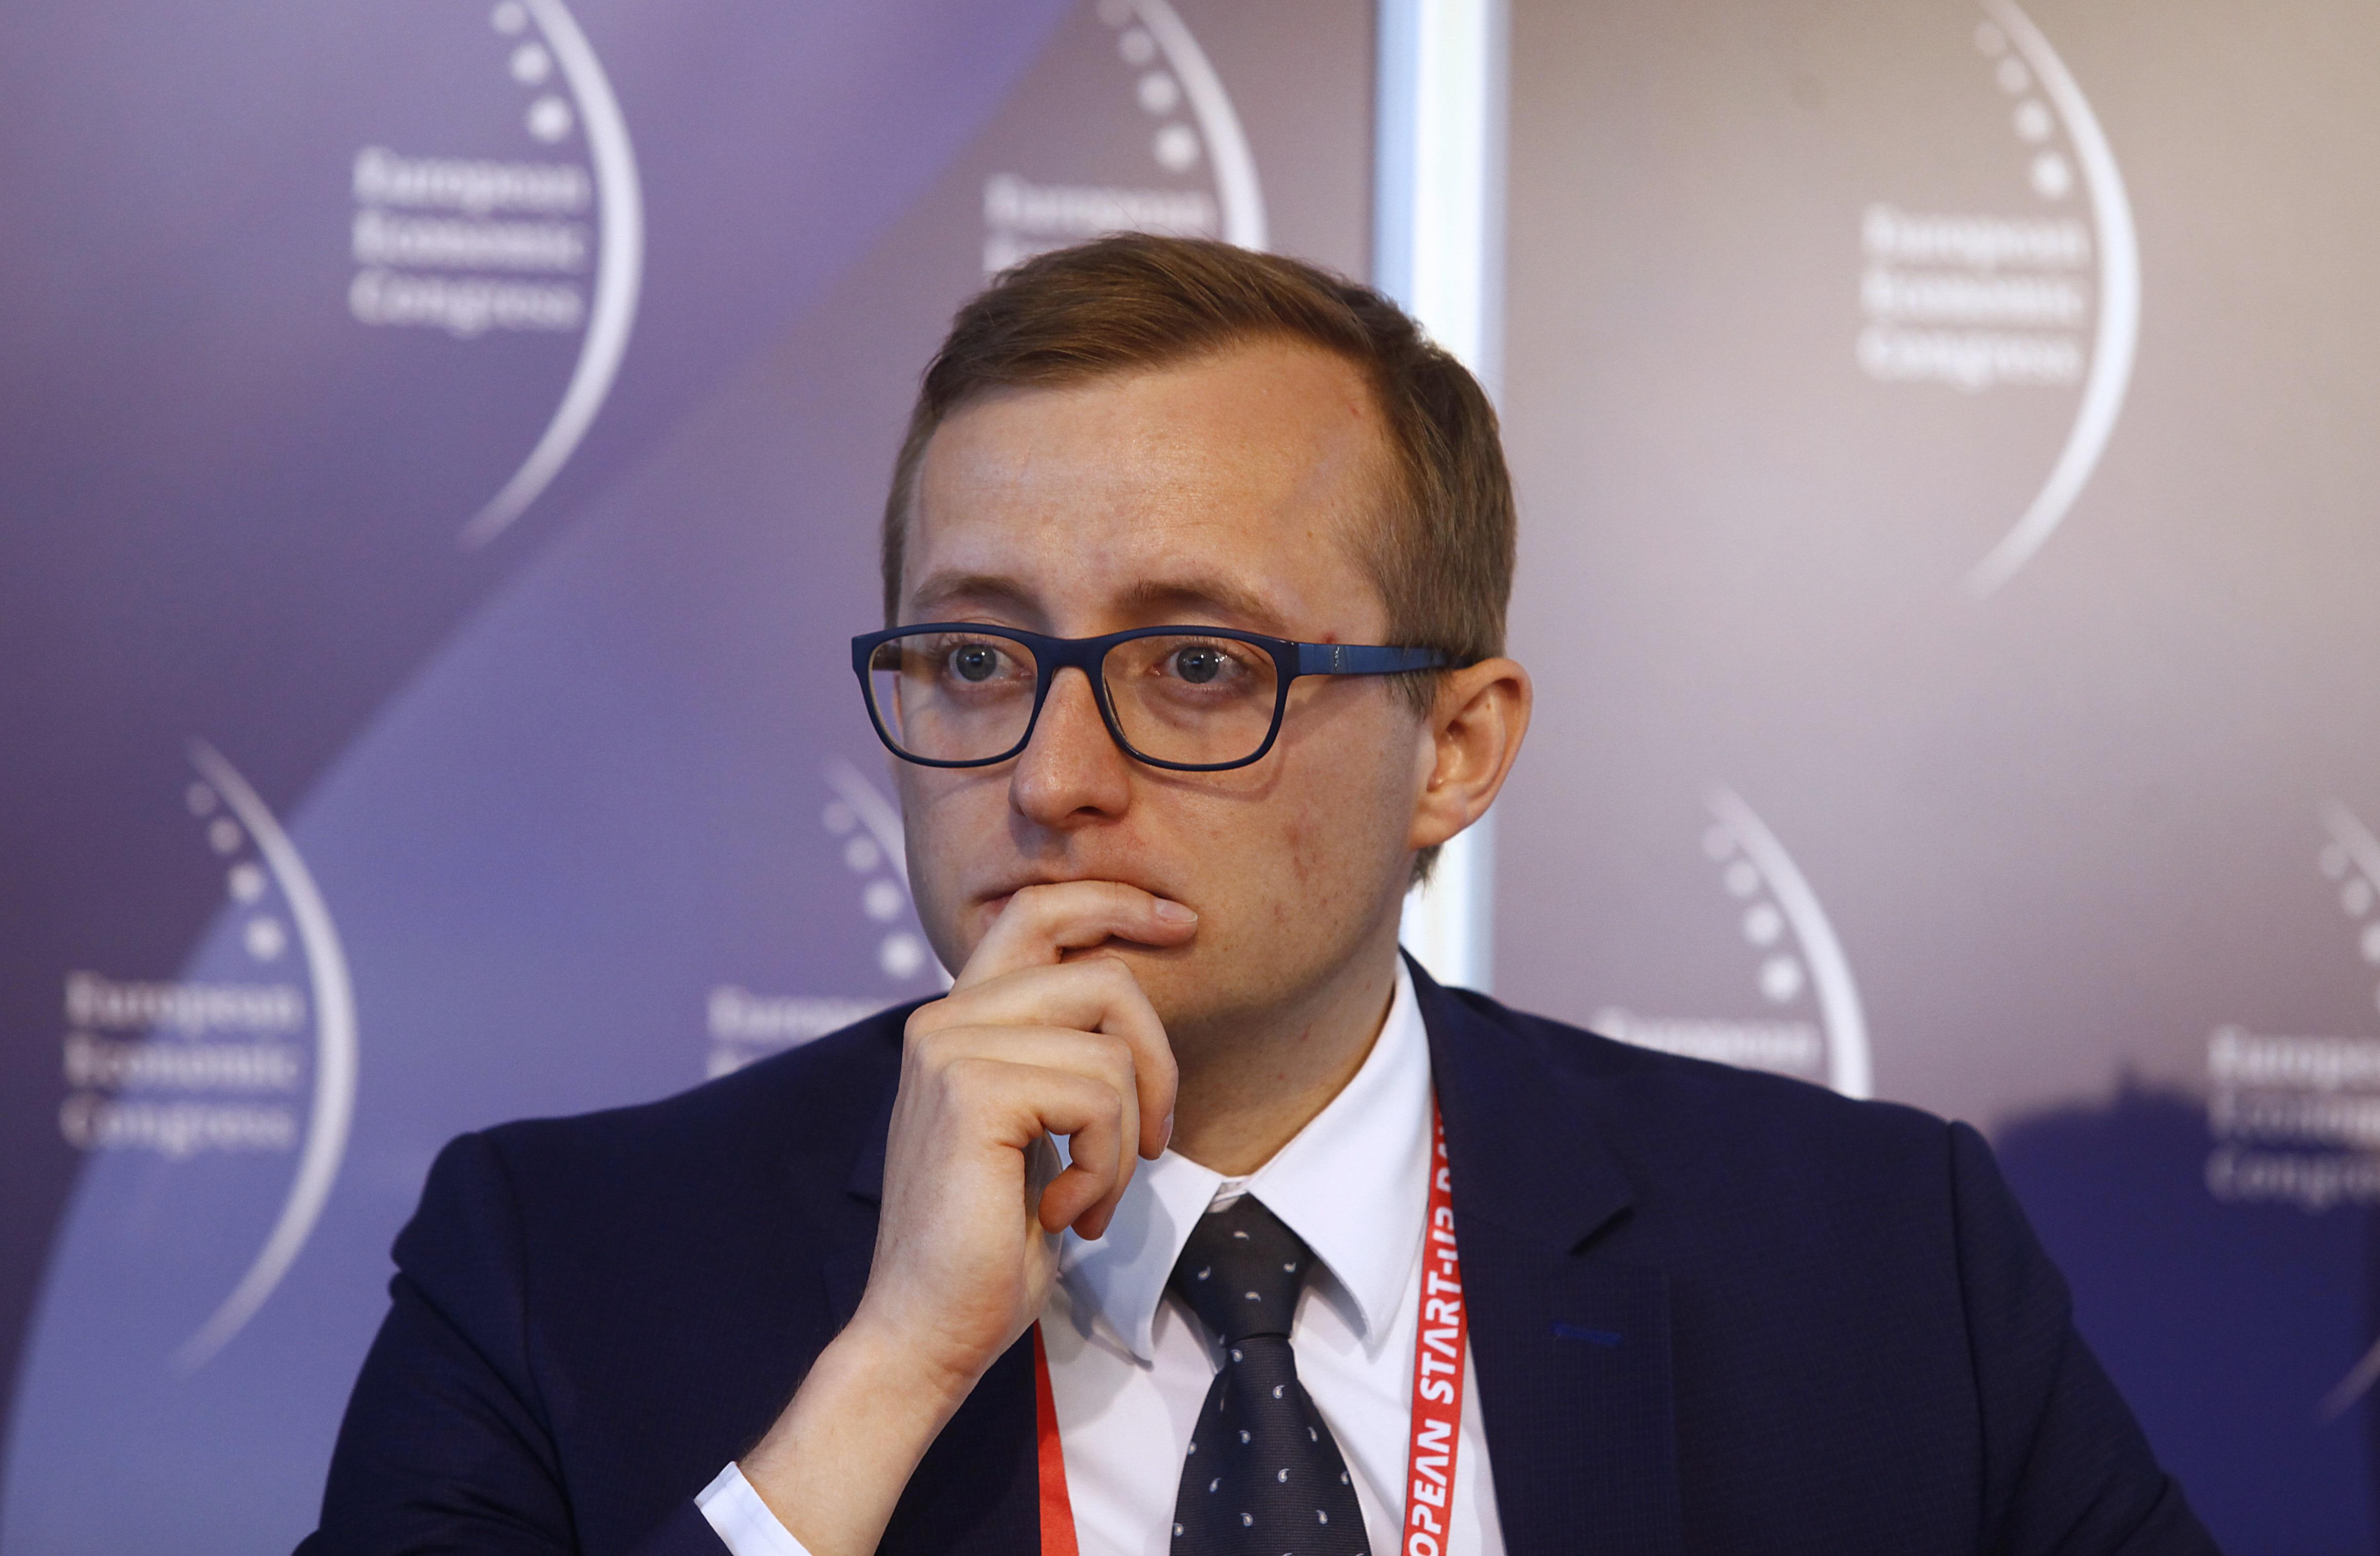 Mateusz Dróźdź, Zagłębie Lubin, fot. PTWP